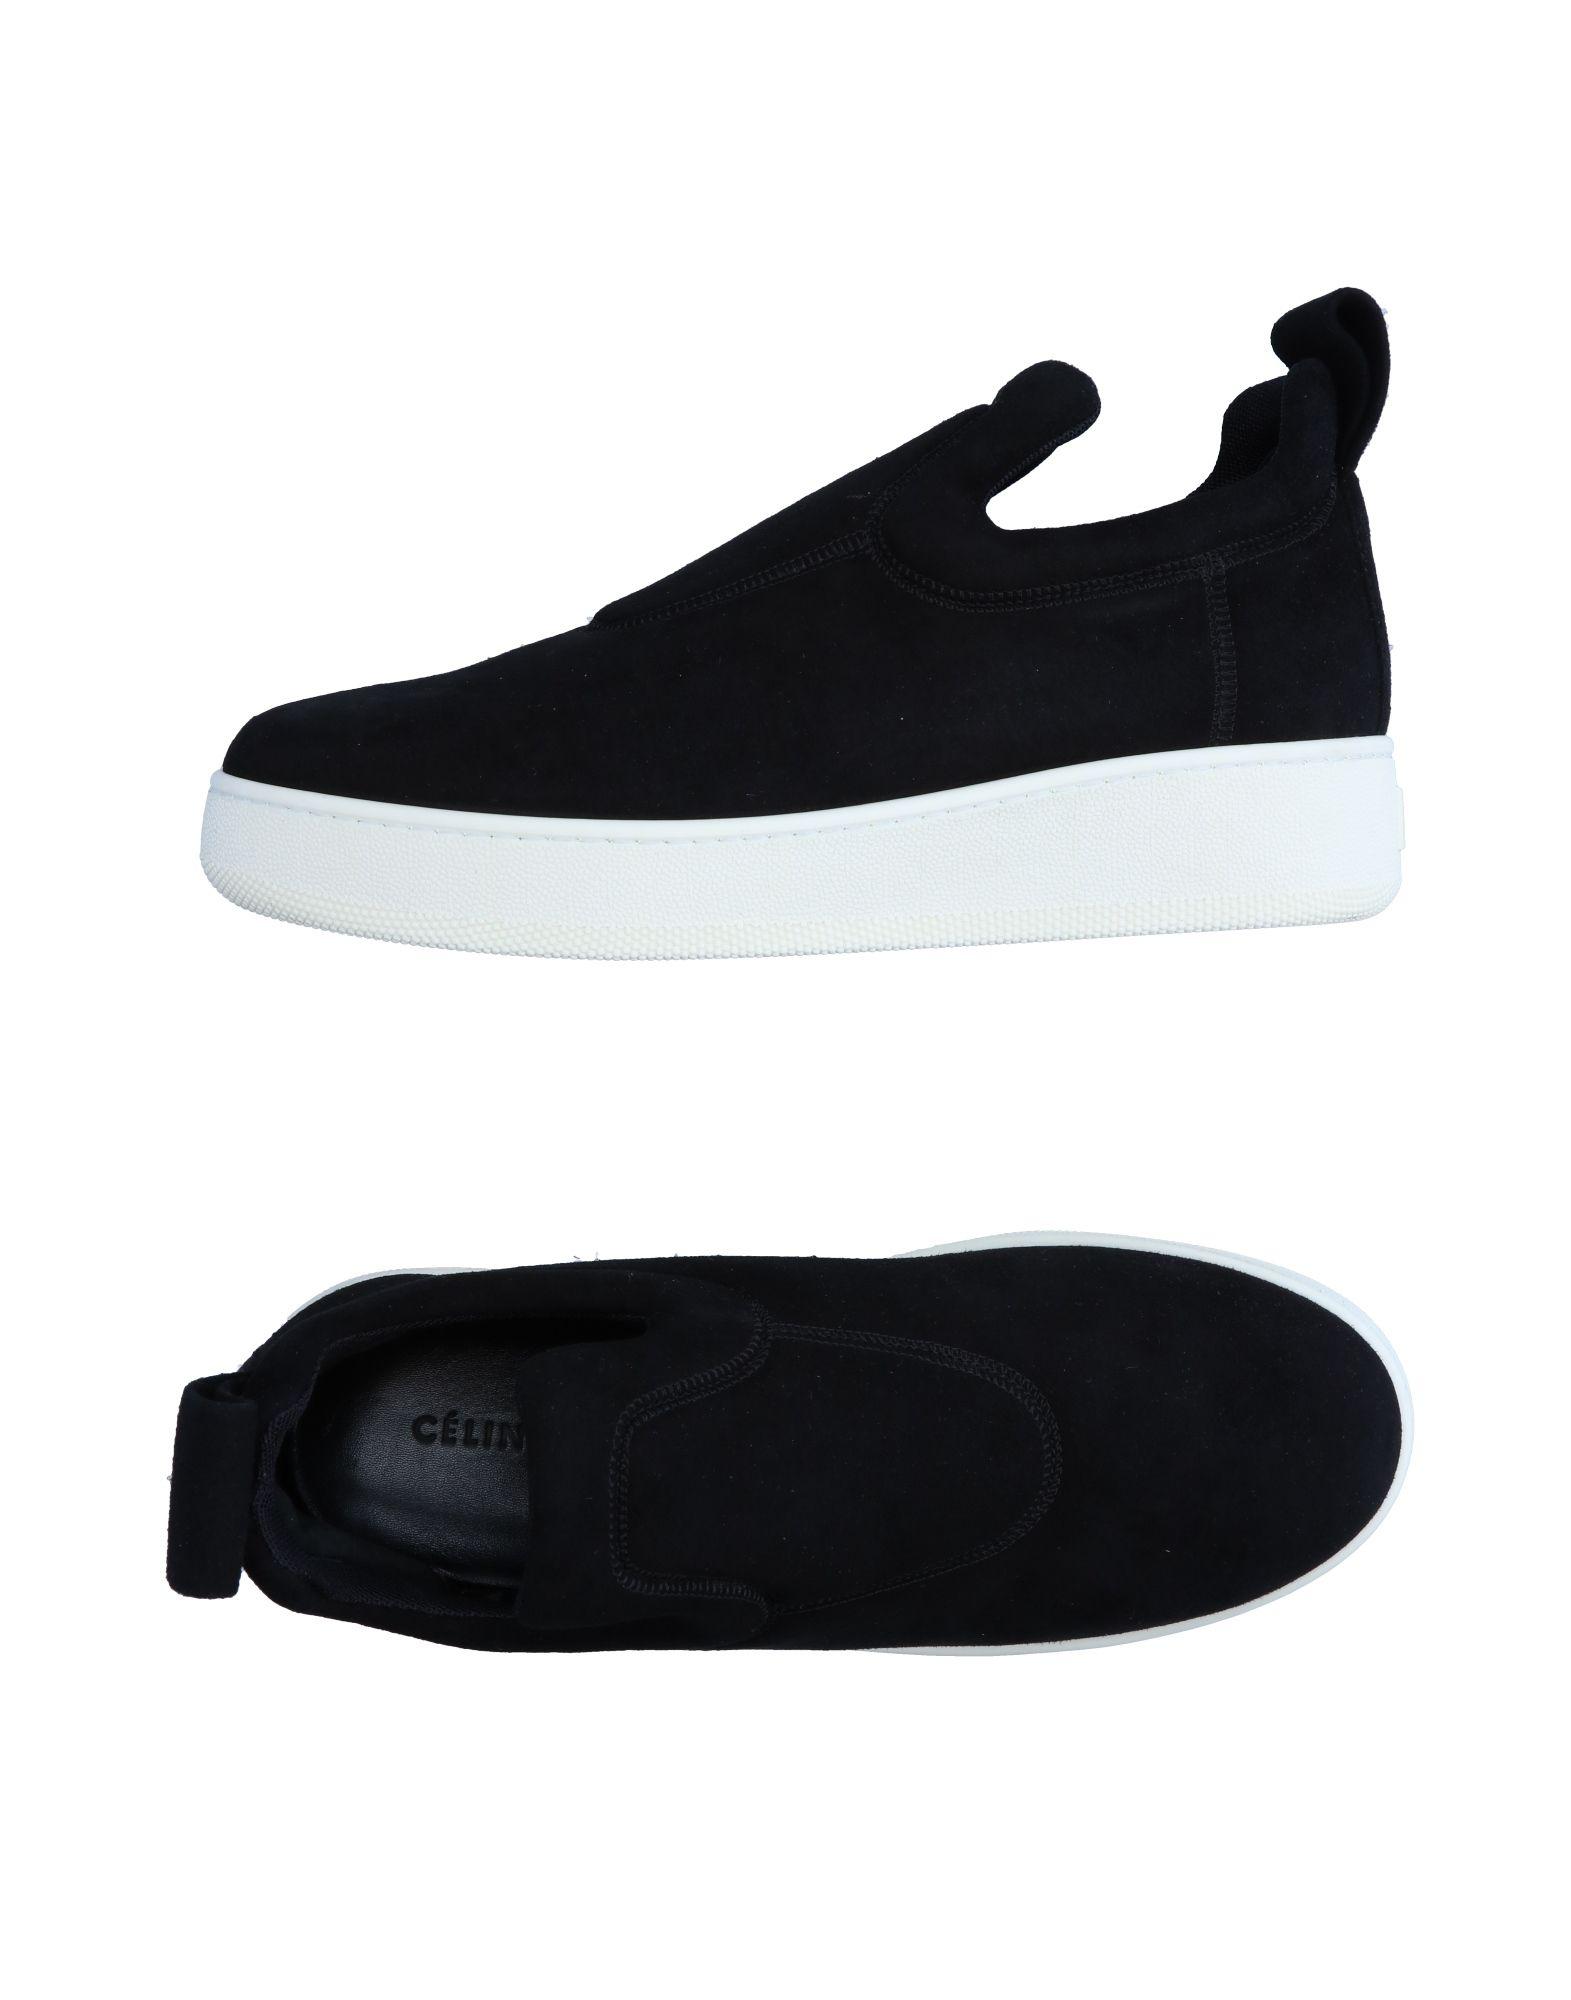 Haltbare Mode billige Schuhe Céline Sneakers Damen  11255997UJ Heiße Schuhe